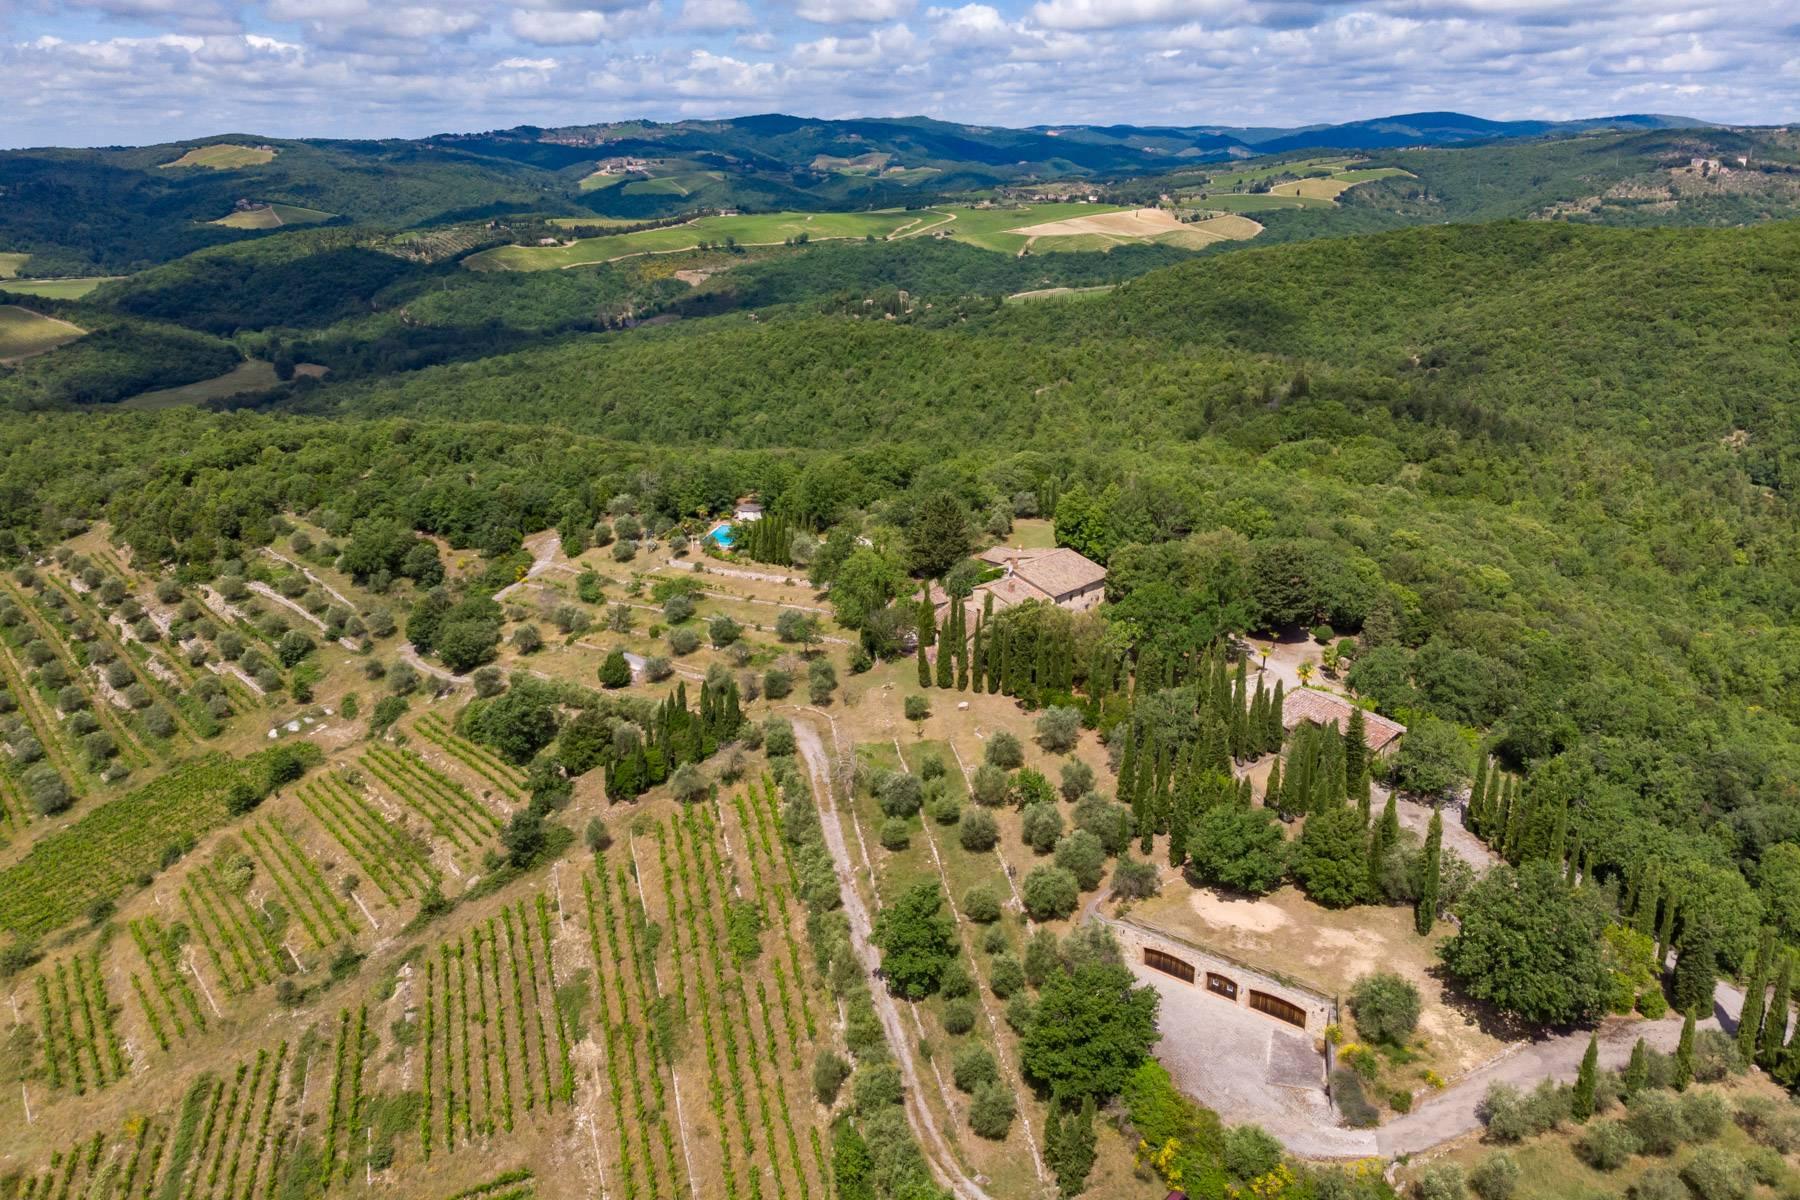 Villa in Vendita a Gaiole In Chianti: 5 locali, 465 mq - Foto 14